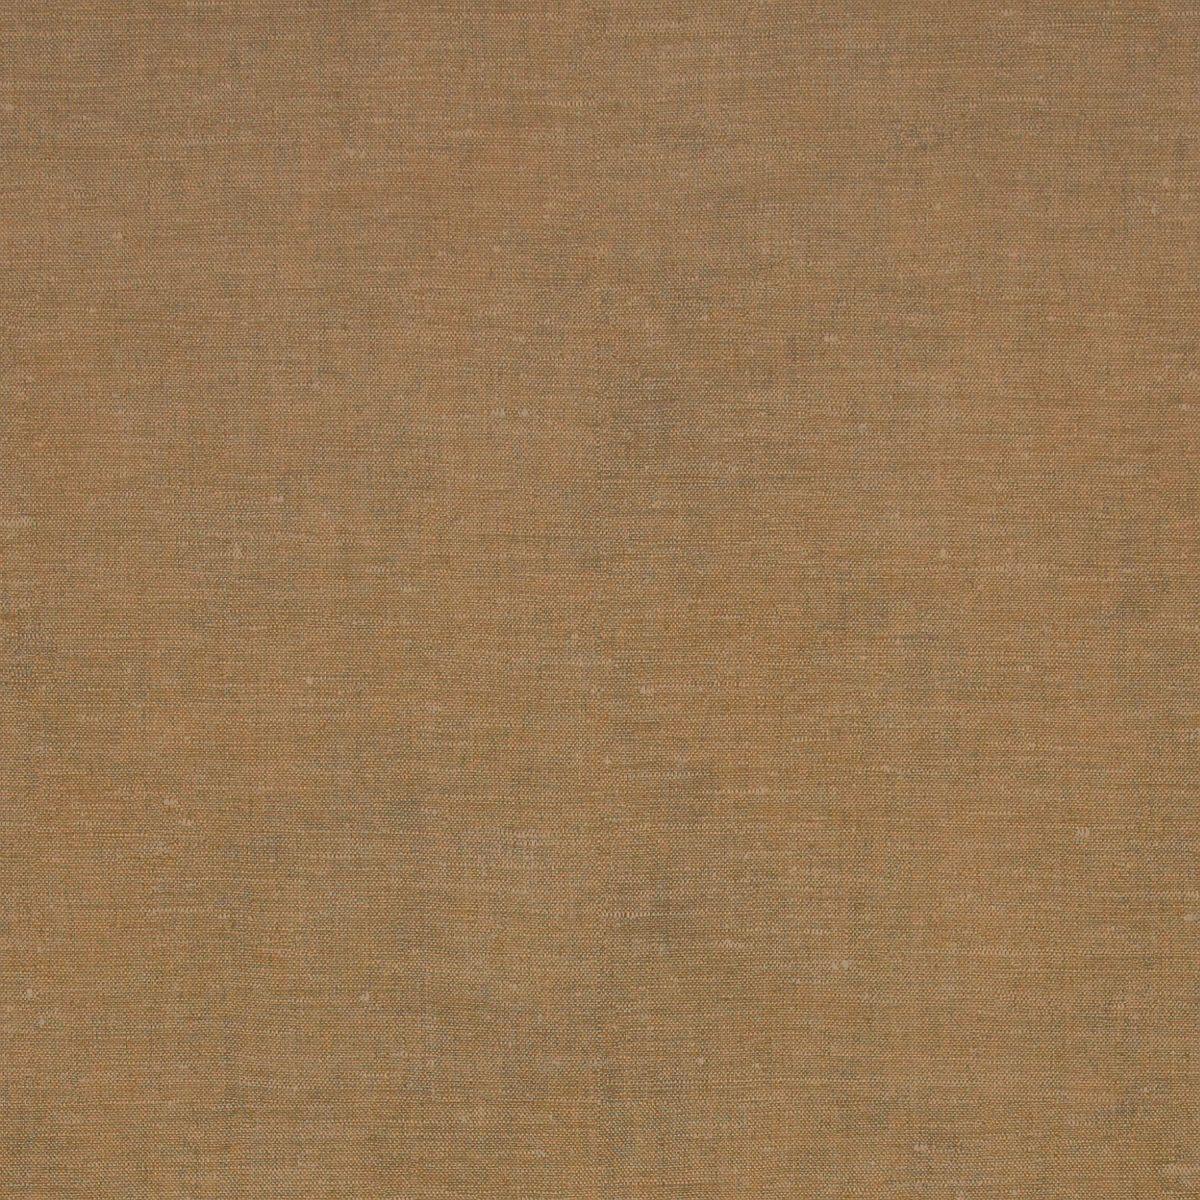 hochwertige tapeten und stoffe b n wallcoverings vliestapete riviera maison 18343 decowunder. Black Bedroom Furniture Sets. Home Design Ideas